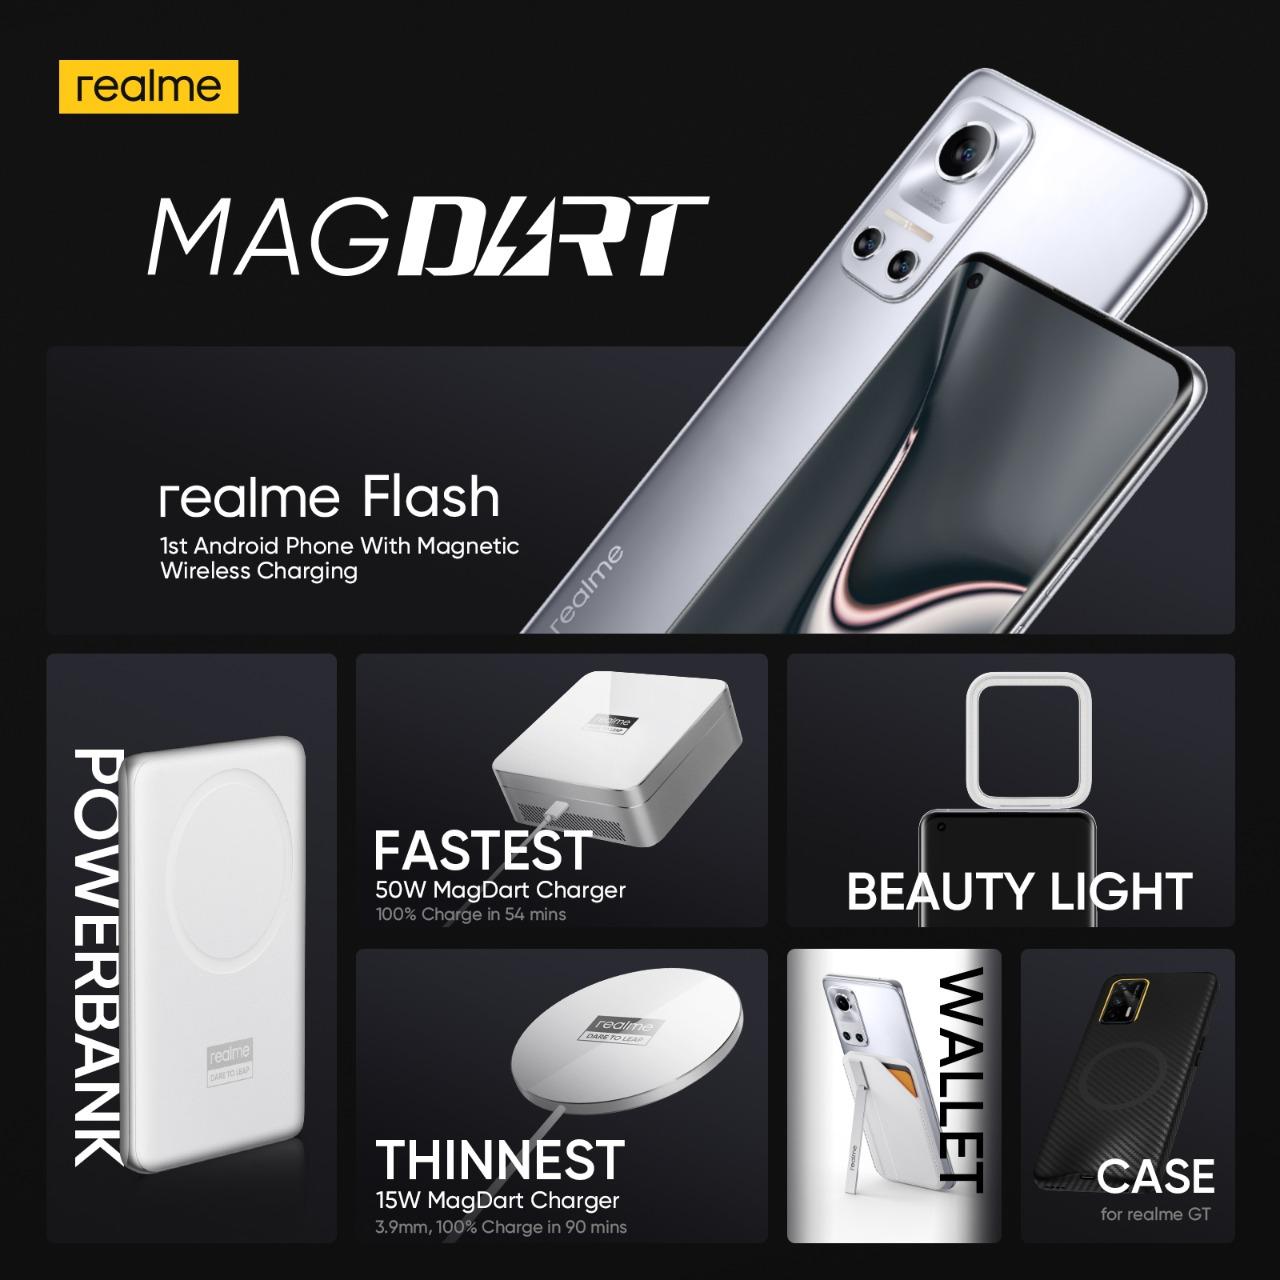 IMG 20210808 WA0187 - Realme العلامة التجارية الأسرع نموًا للهواتف الذكية للوصول إلى 100 مليون مستخدم